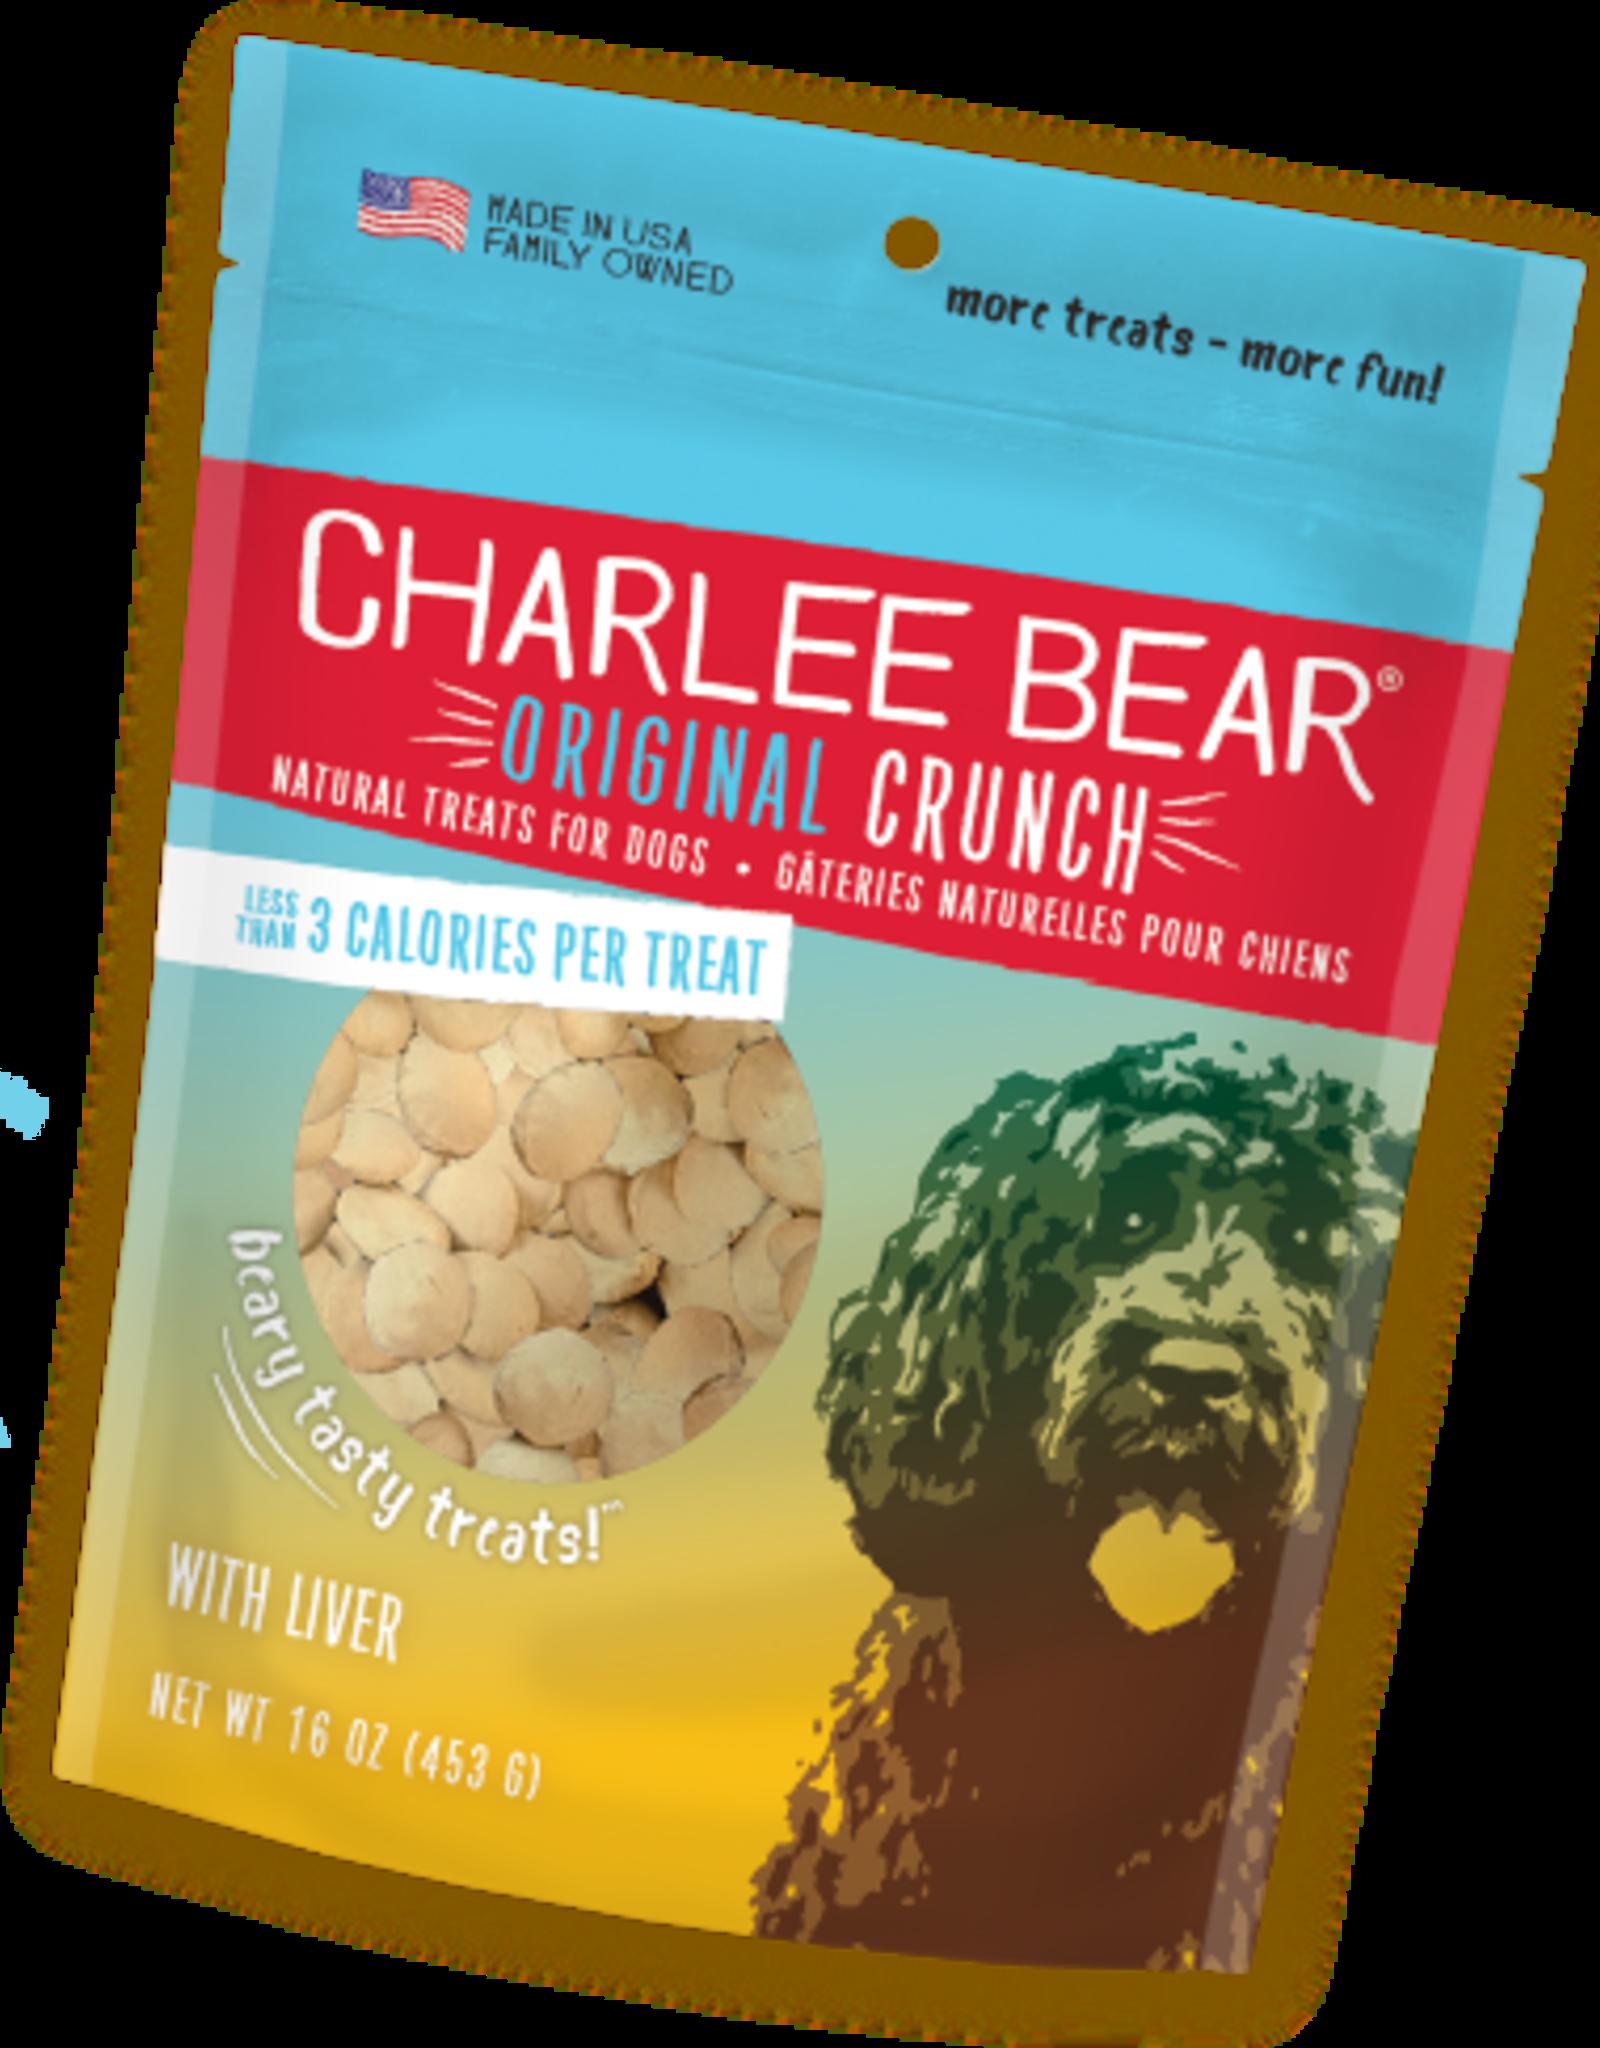 CHARLEE BEAR CHARLEE BEAR DOG TREATS LIVER 16OZ